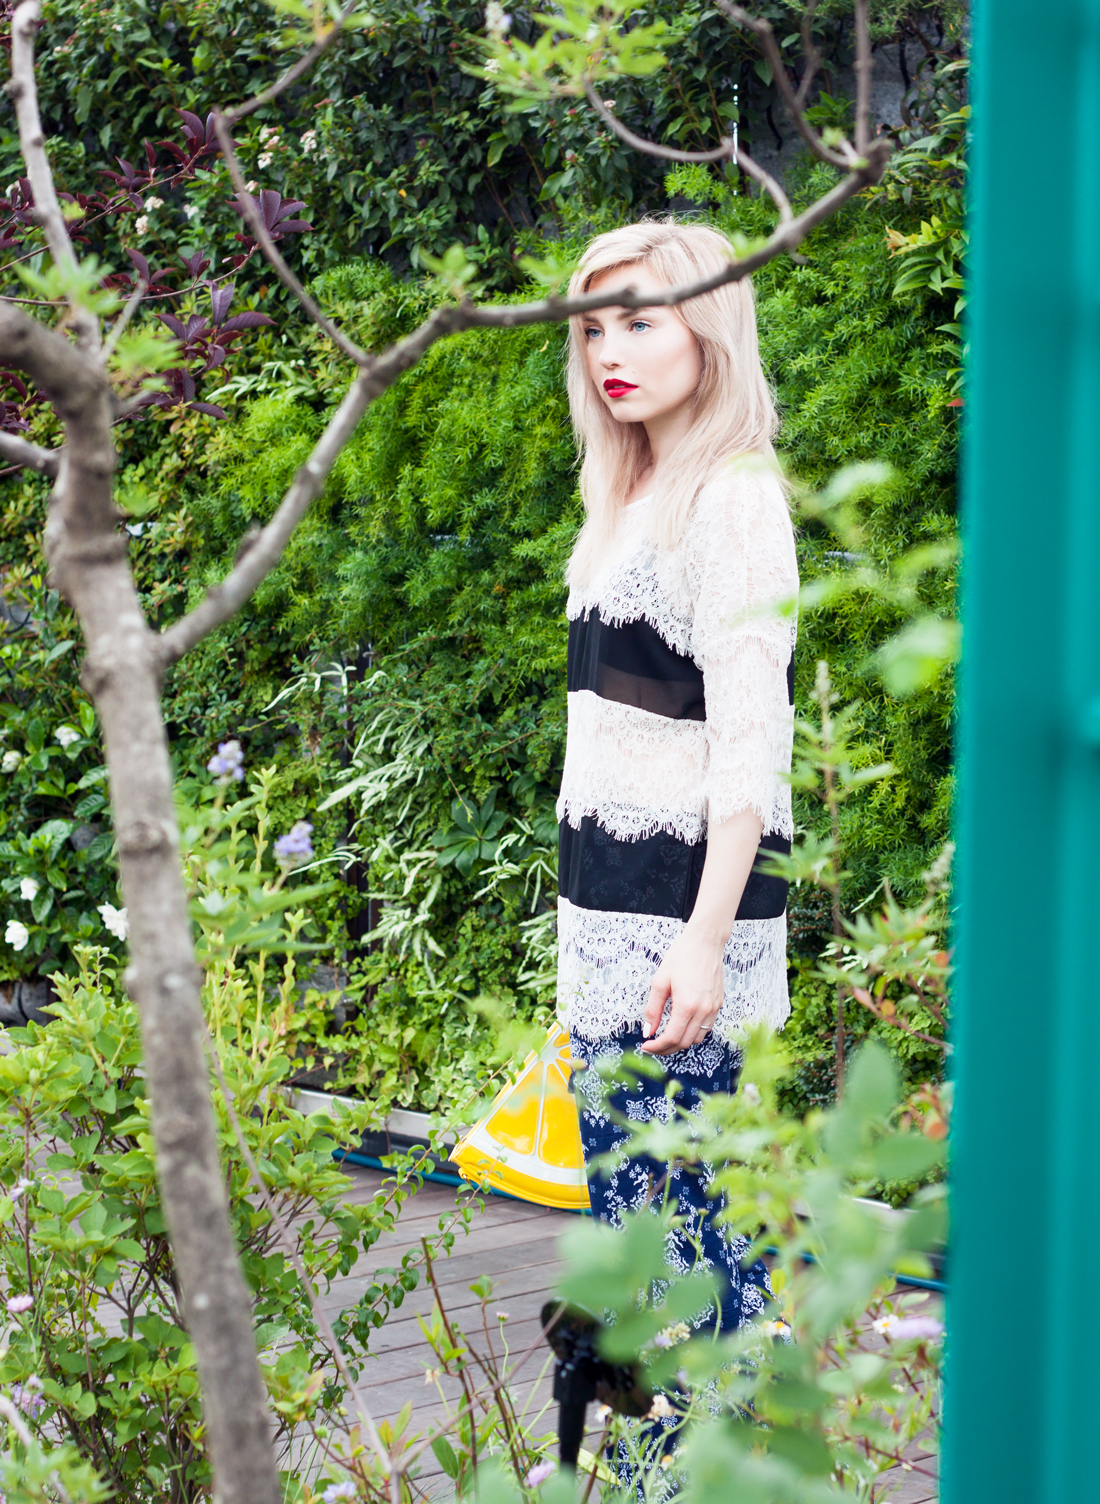 lemon clutch, lemon, japan, tokyo, tokyo fashion blog, face stockholm lipstick, seibu rooftop, red lips, tokyo summer